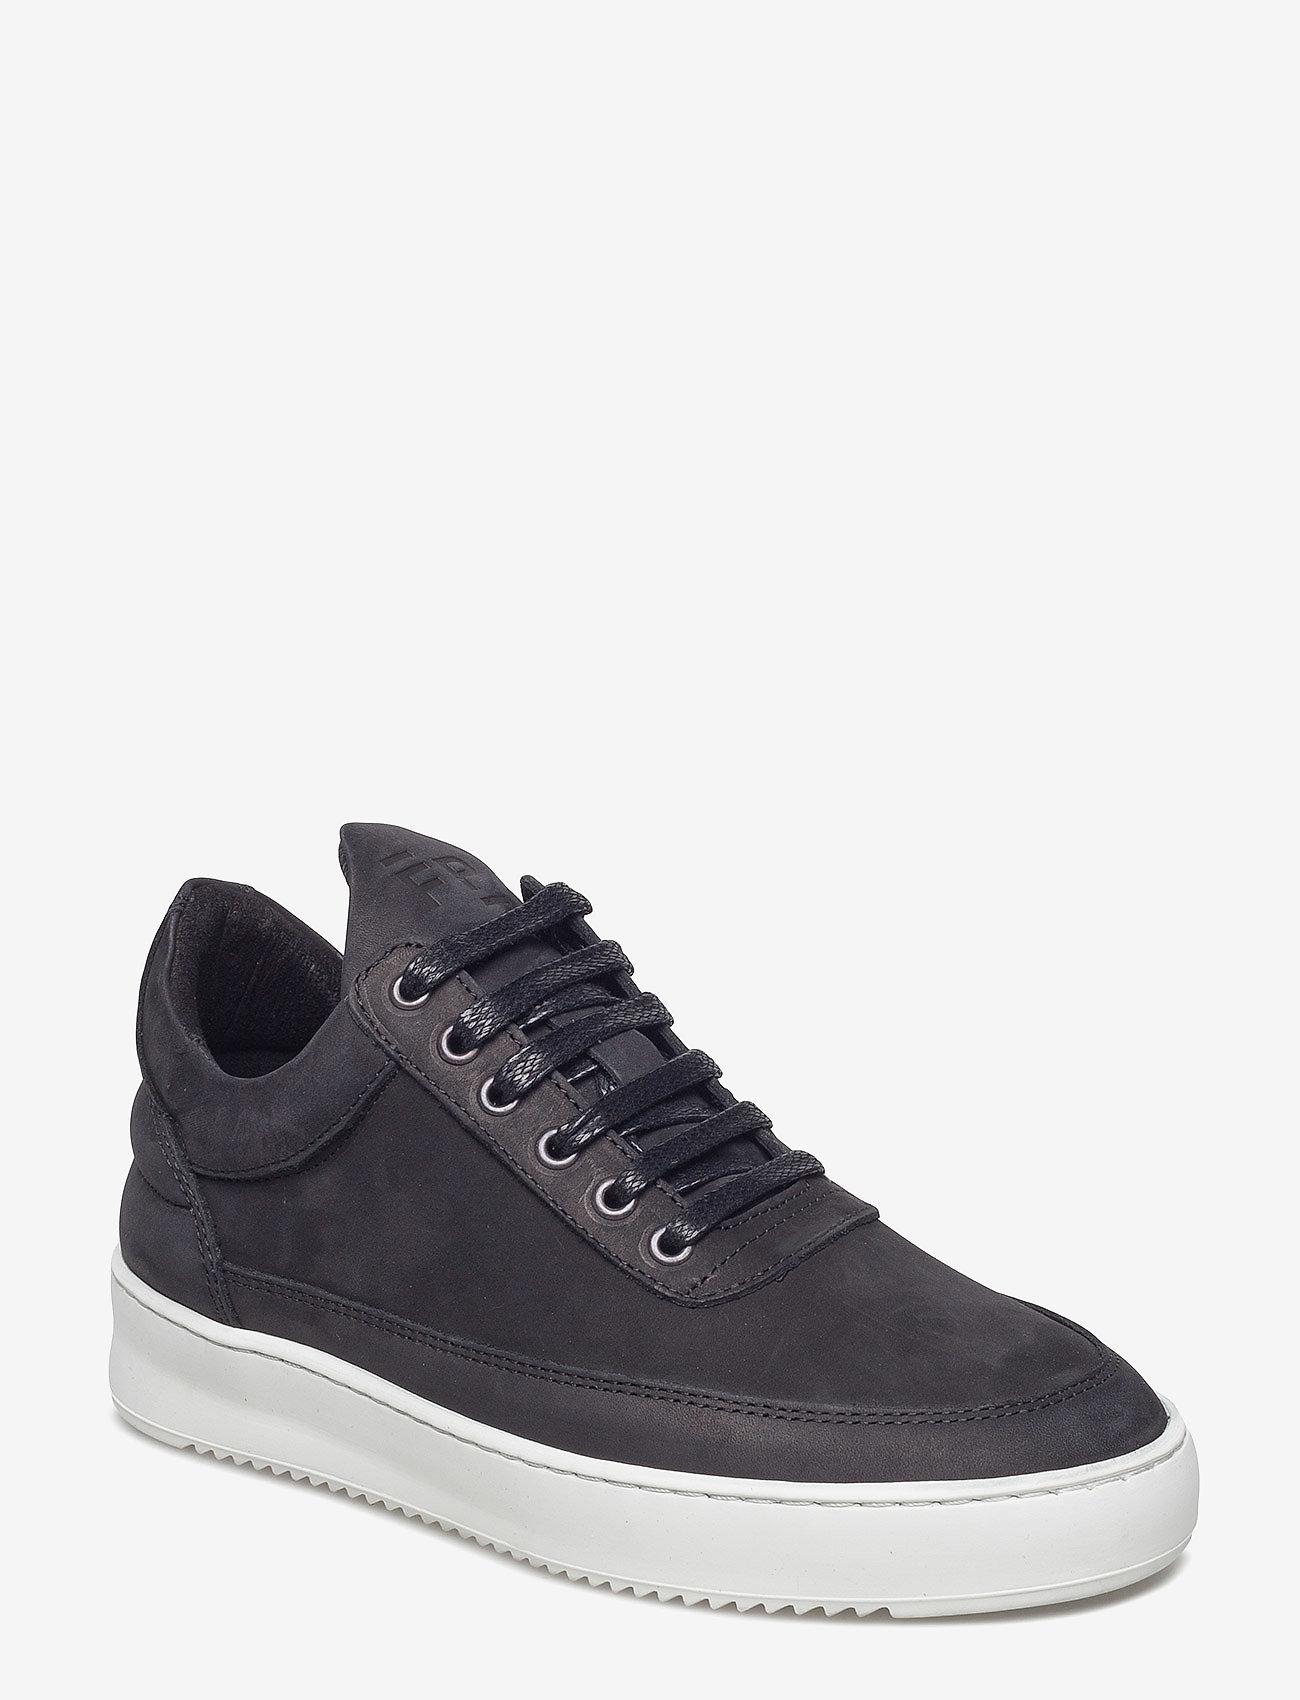 Filling Pieces - Low Top Ripple Basic Black / White - låga sneakers - black/white - 0